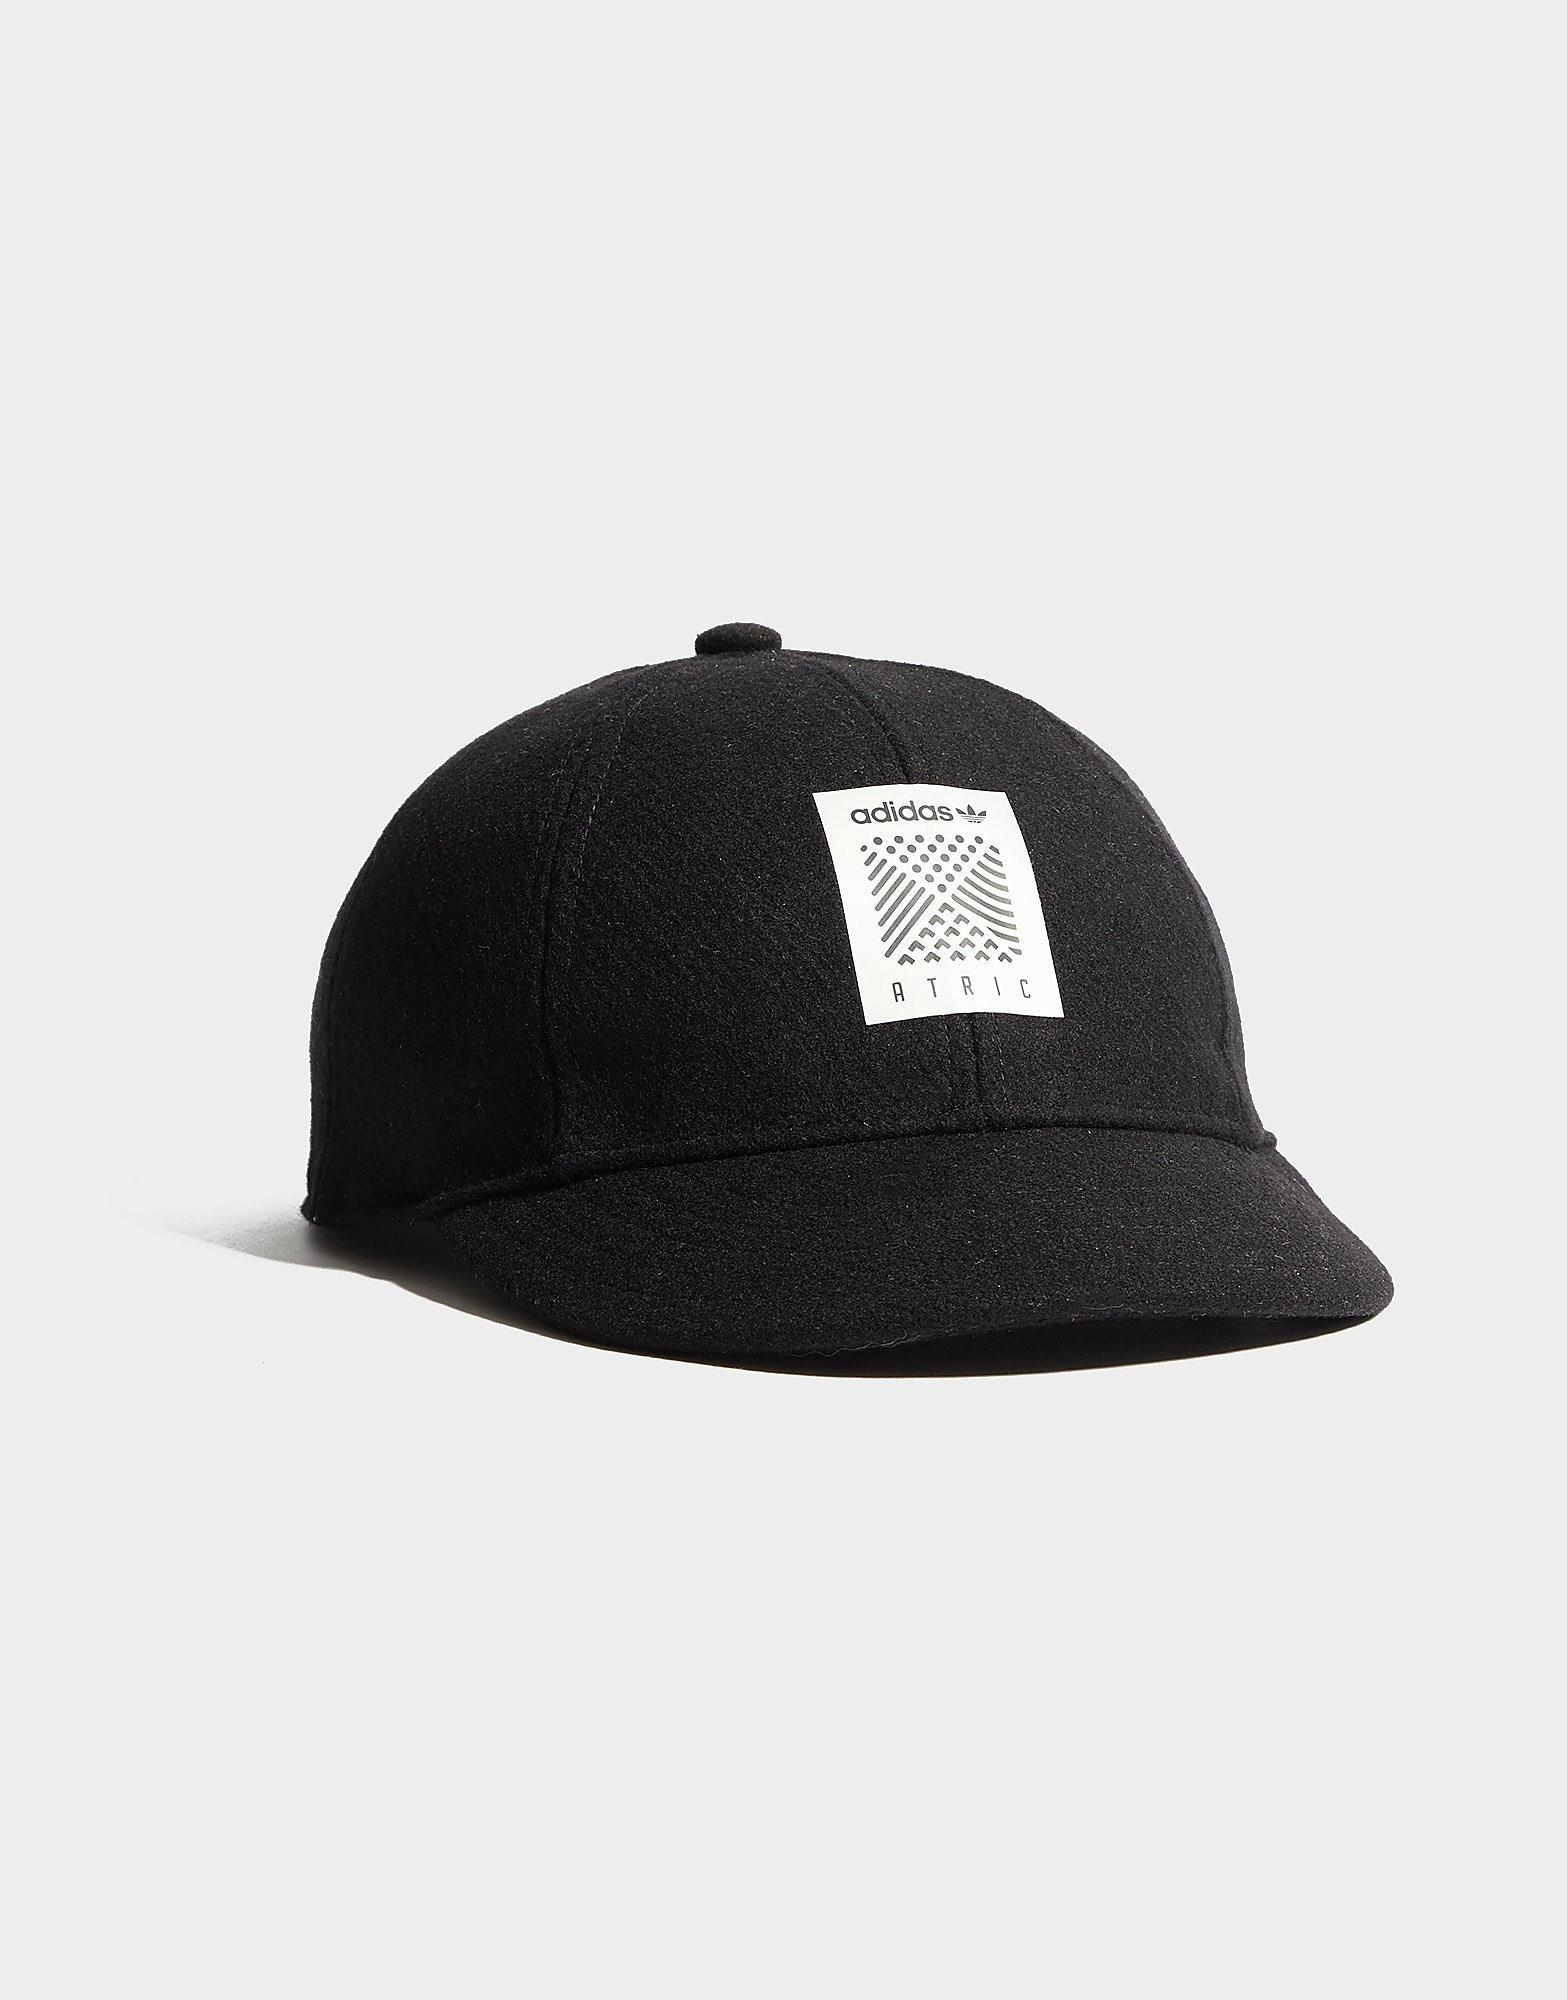 adidas Originals Atric Baseball Cap - Zwart - Heren